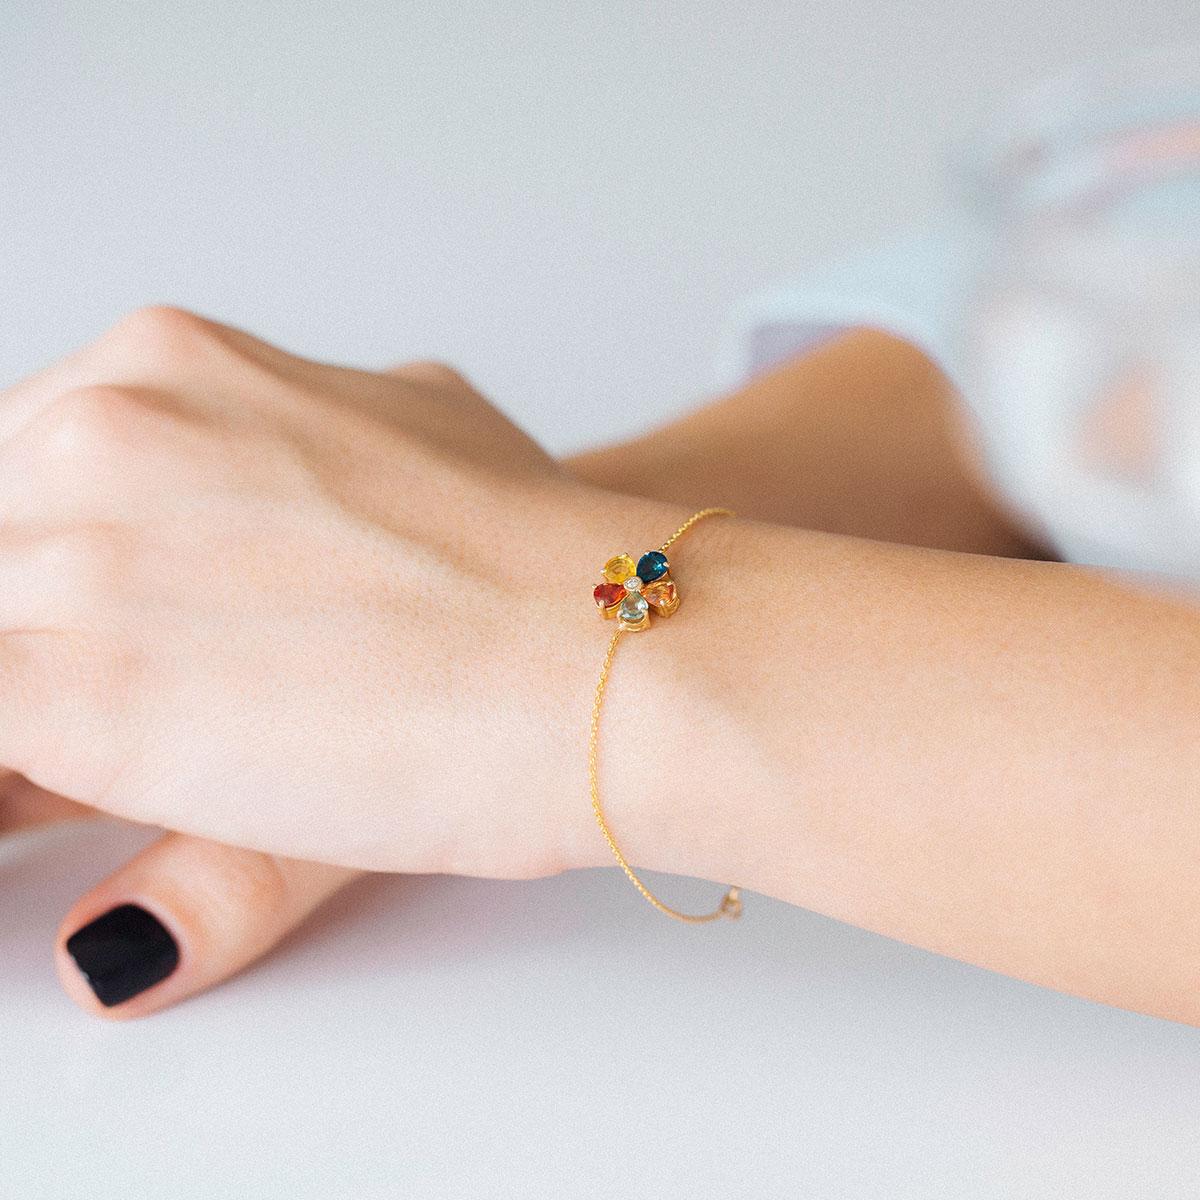 دستبند طلا مولتی کالر